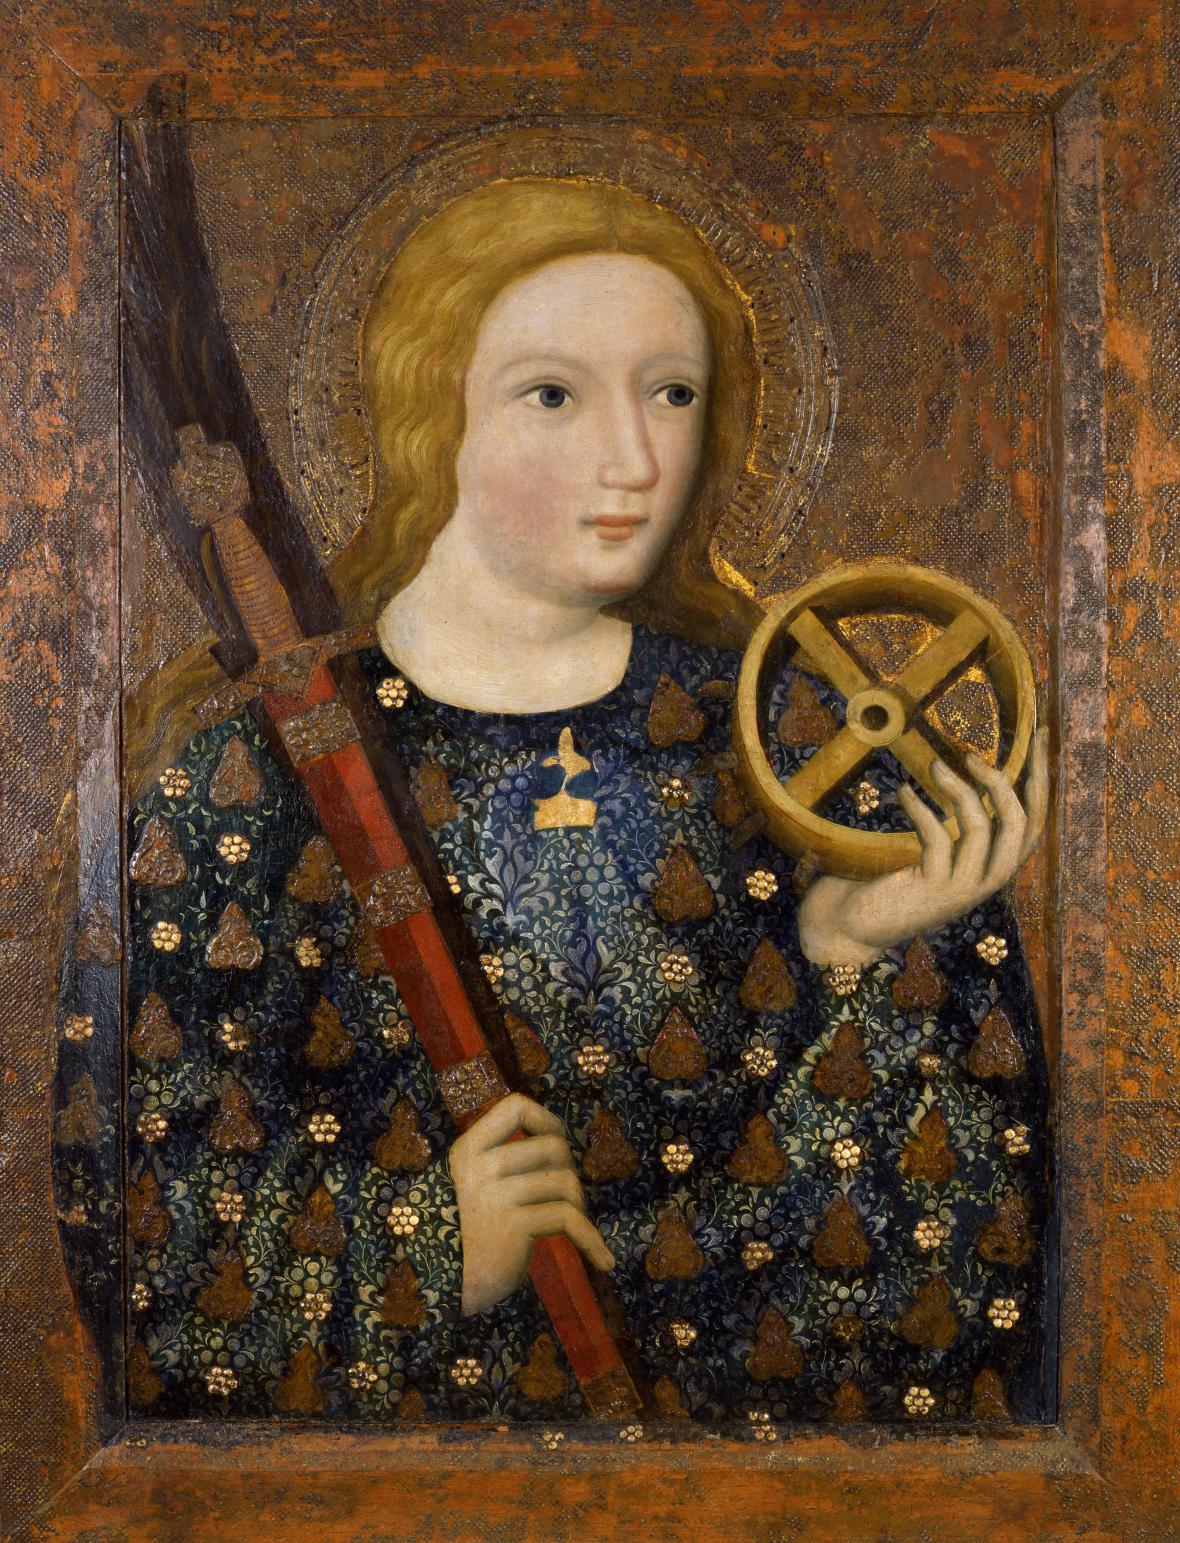 Sv. Kateřina, Mistr Theodorik, Praha, 1360-1364